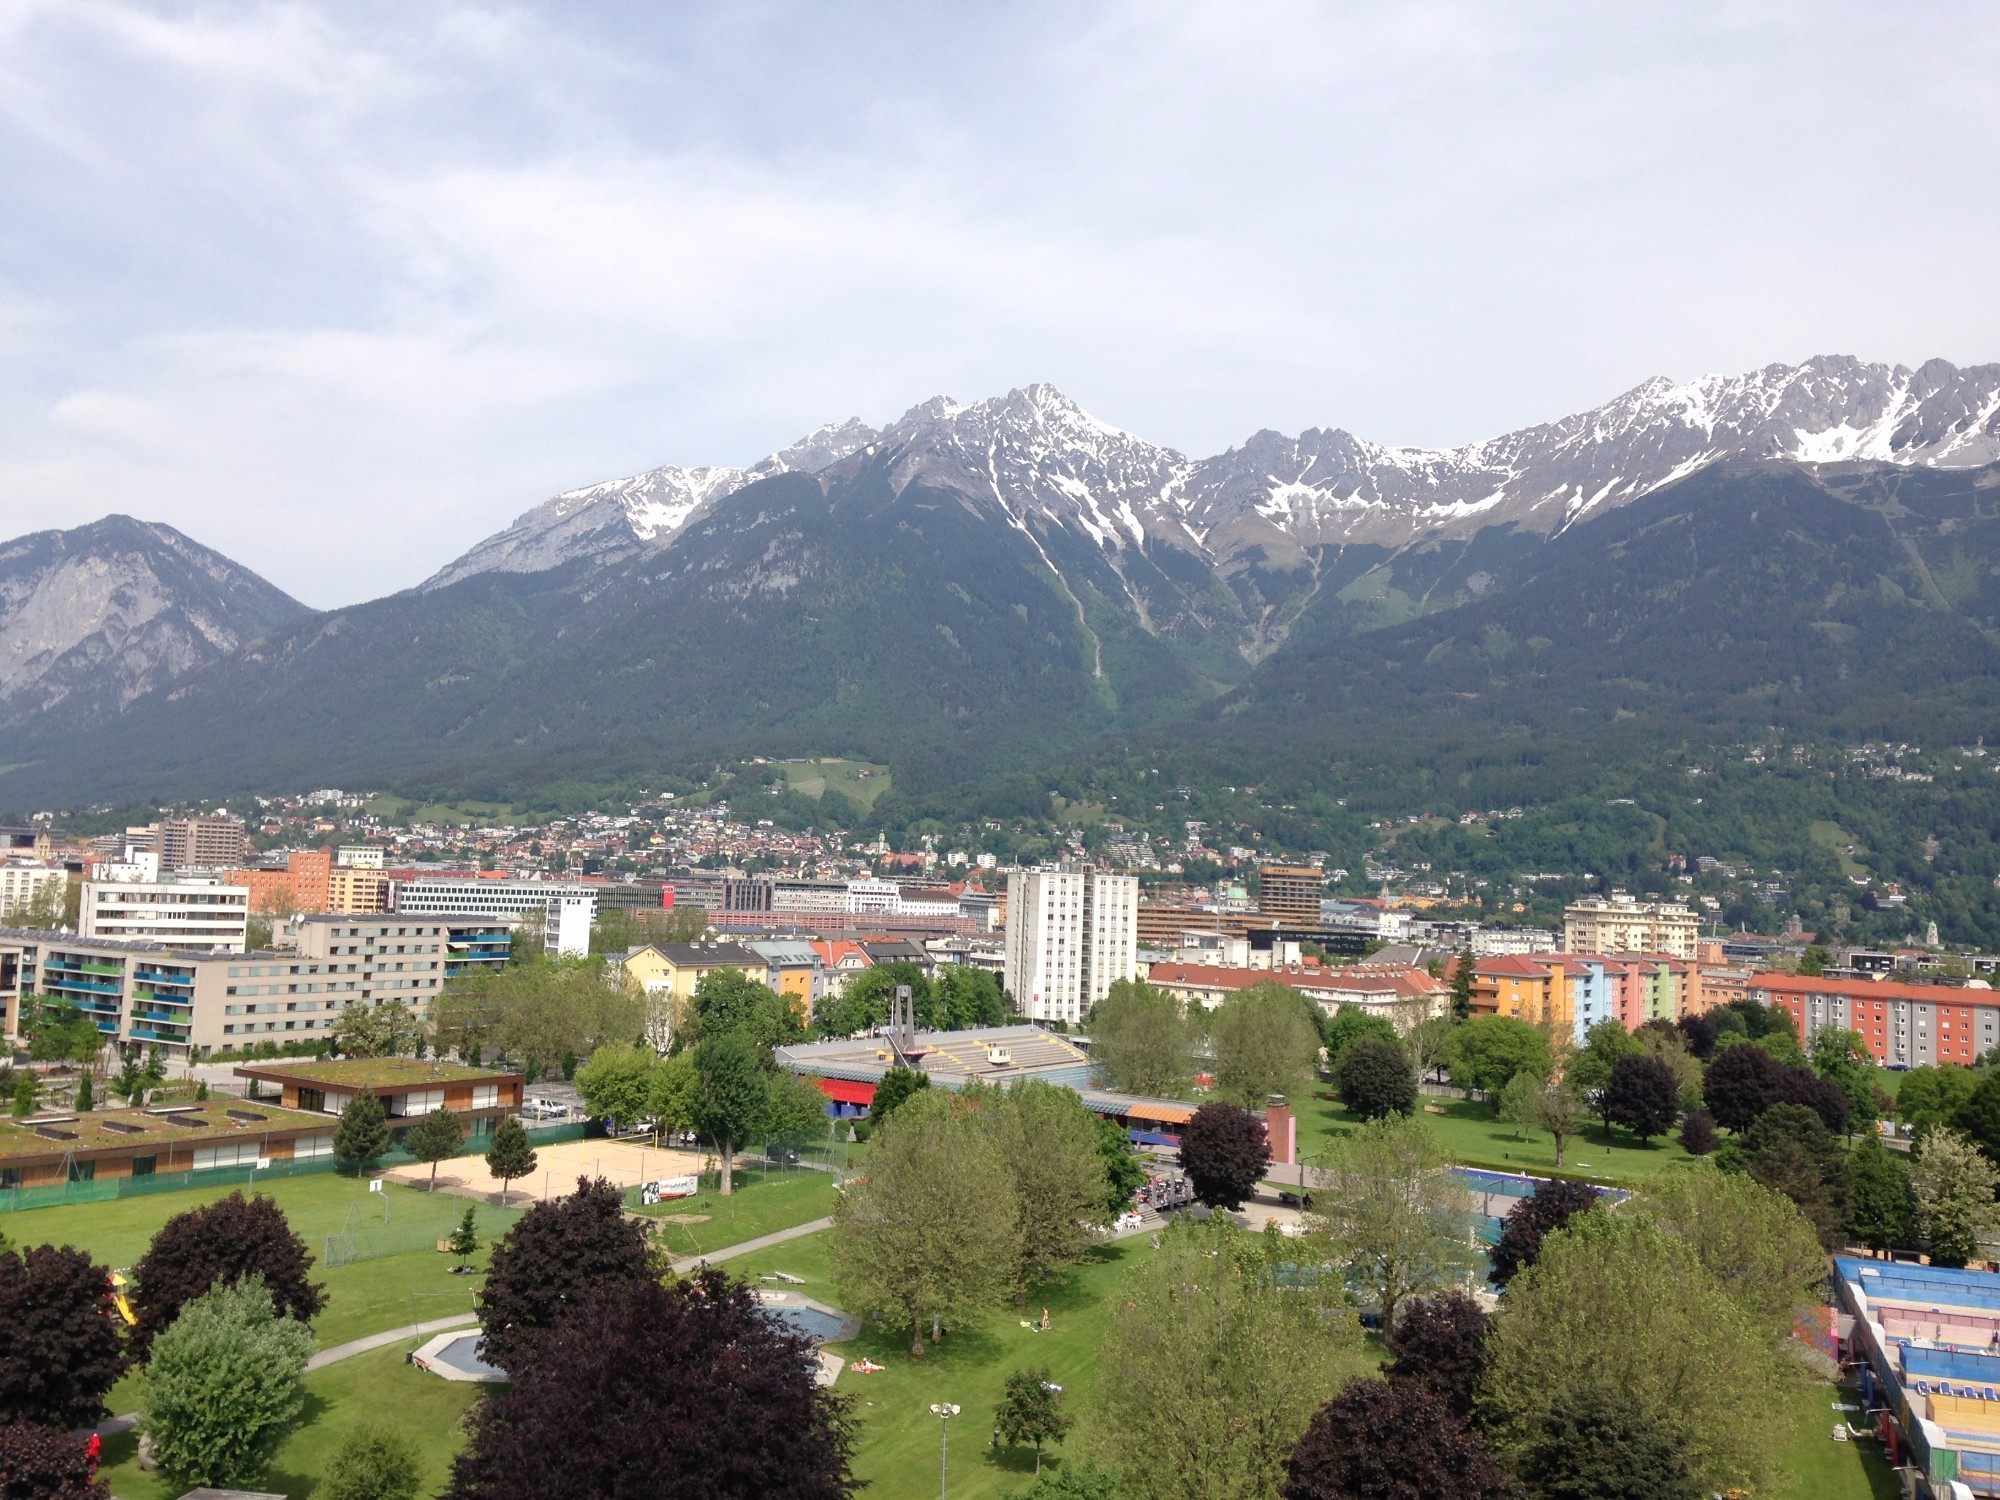 View of Innsbruck from the top of Ramada Innsbruck Tivoli Hotel.